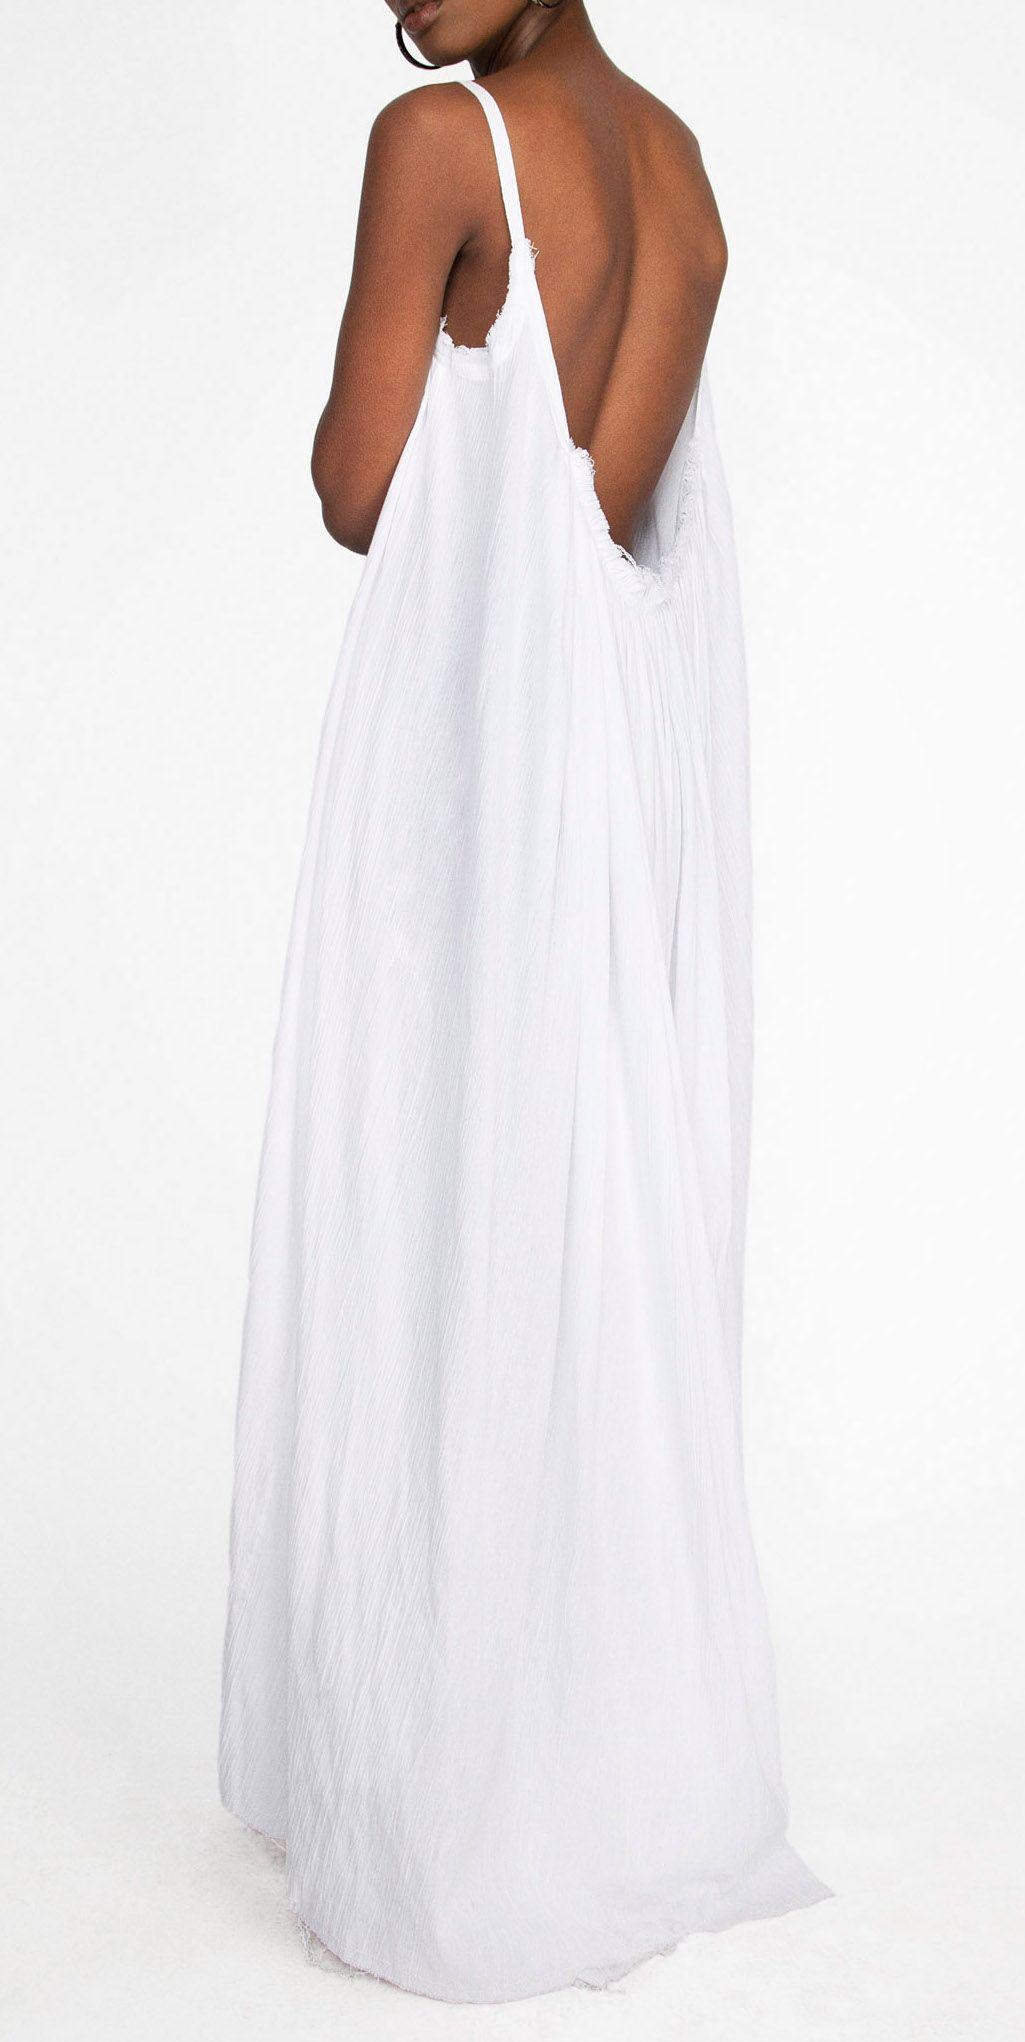 Gathered Gauze Organic Cotton Maxi Dress Made From 100 Organic Cotton Gauze Maxi Dress Cotton Gauze Maxi Dress Glamorous Evening Gowns [ 2042 x 1025 Pixel ]